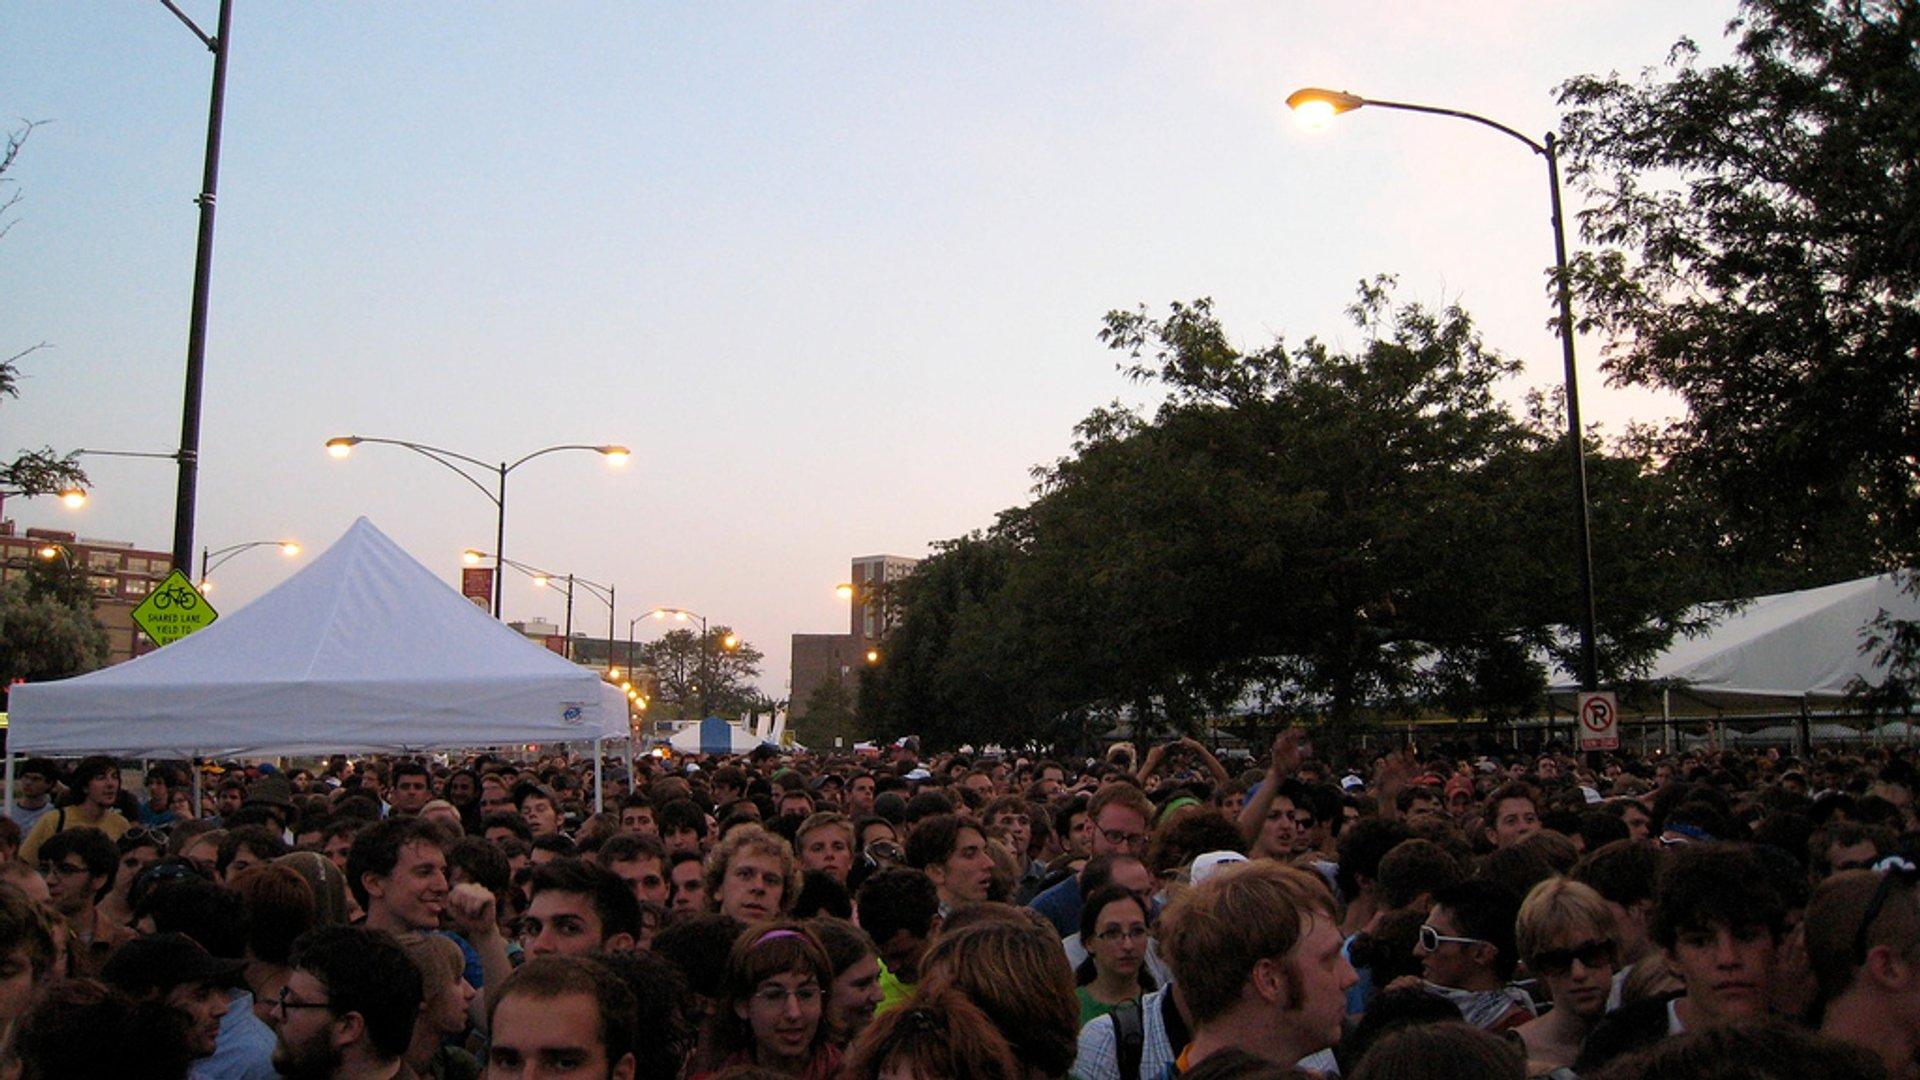 Pitchfork Music Festival in Chicago - Best Season 2020